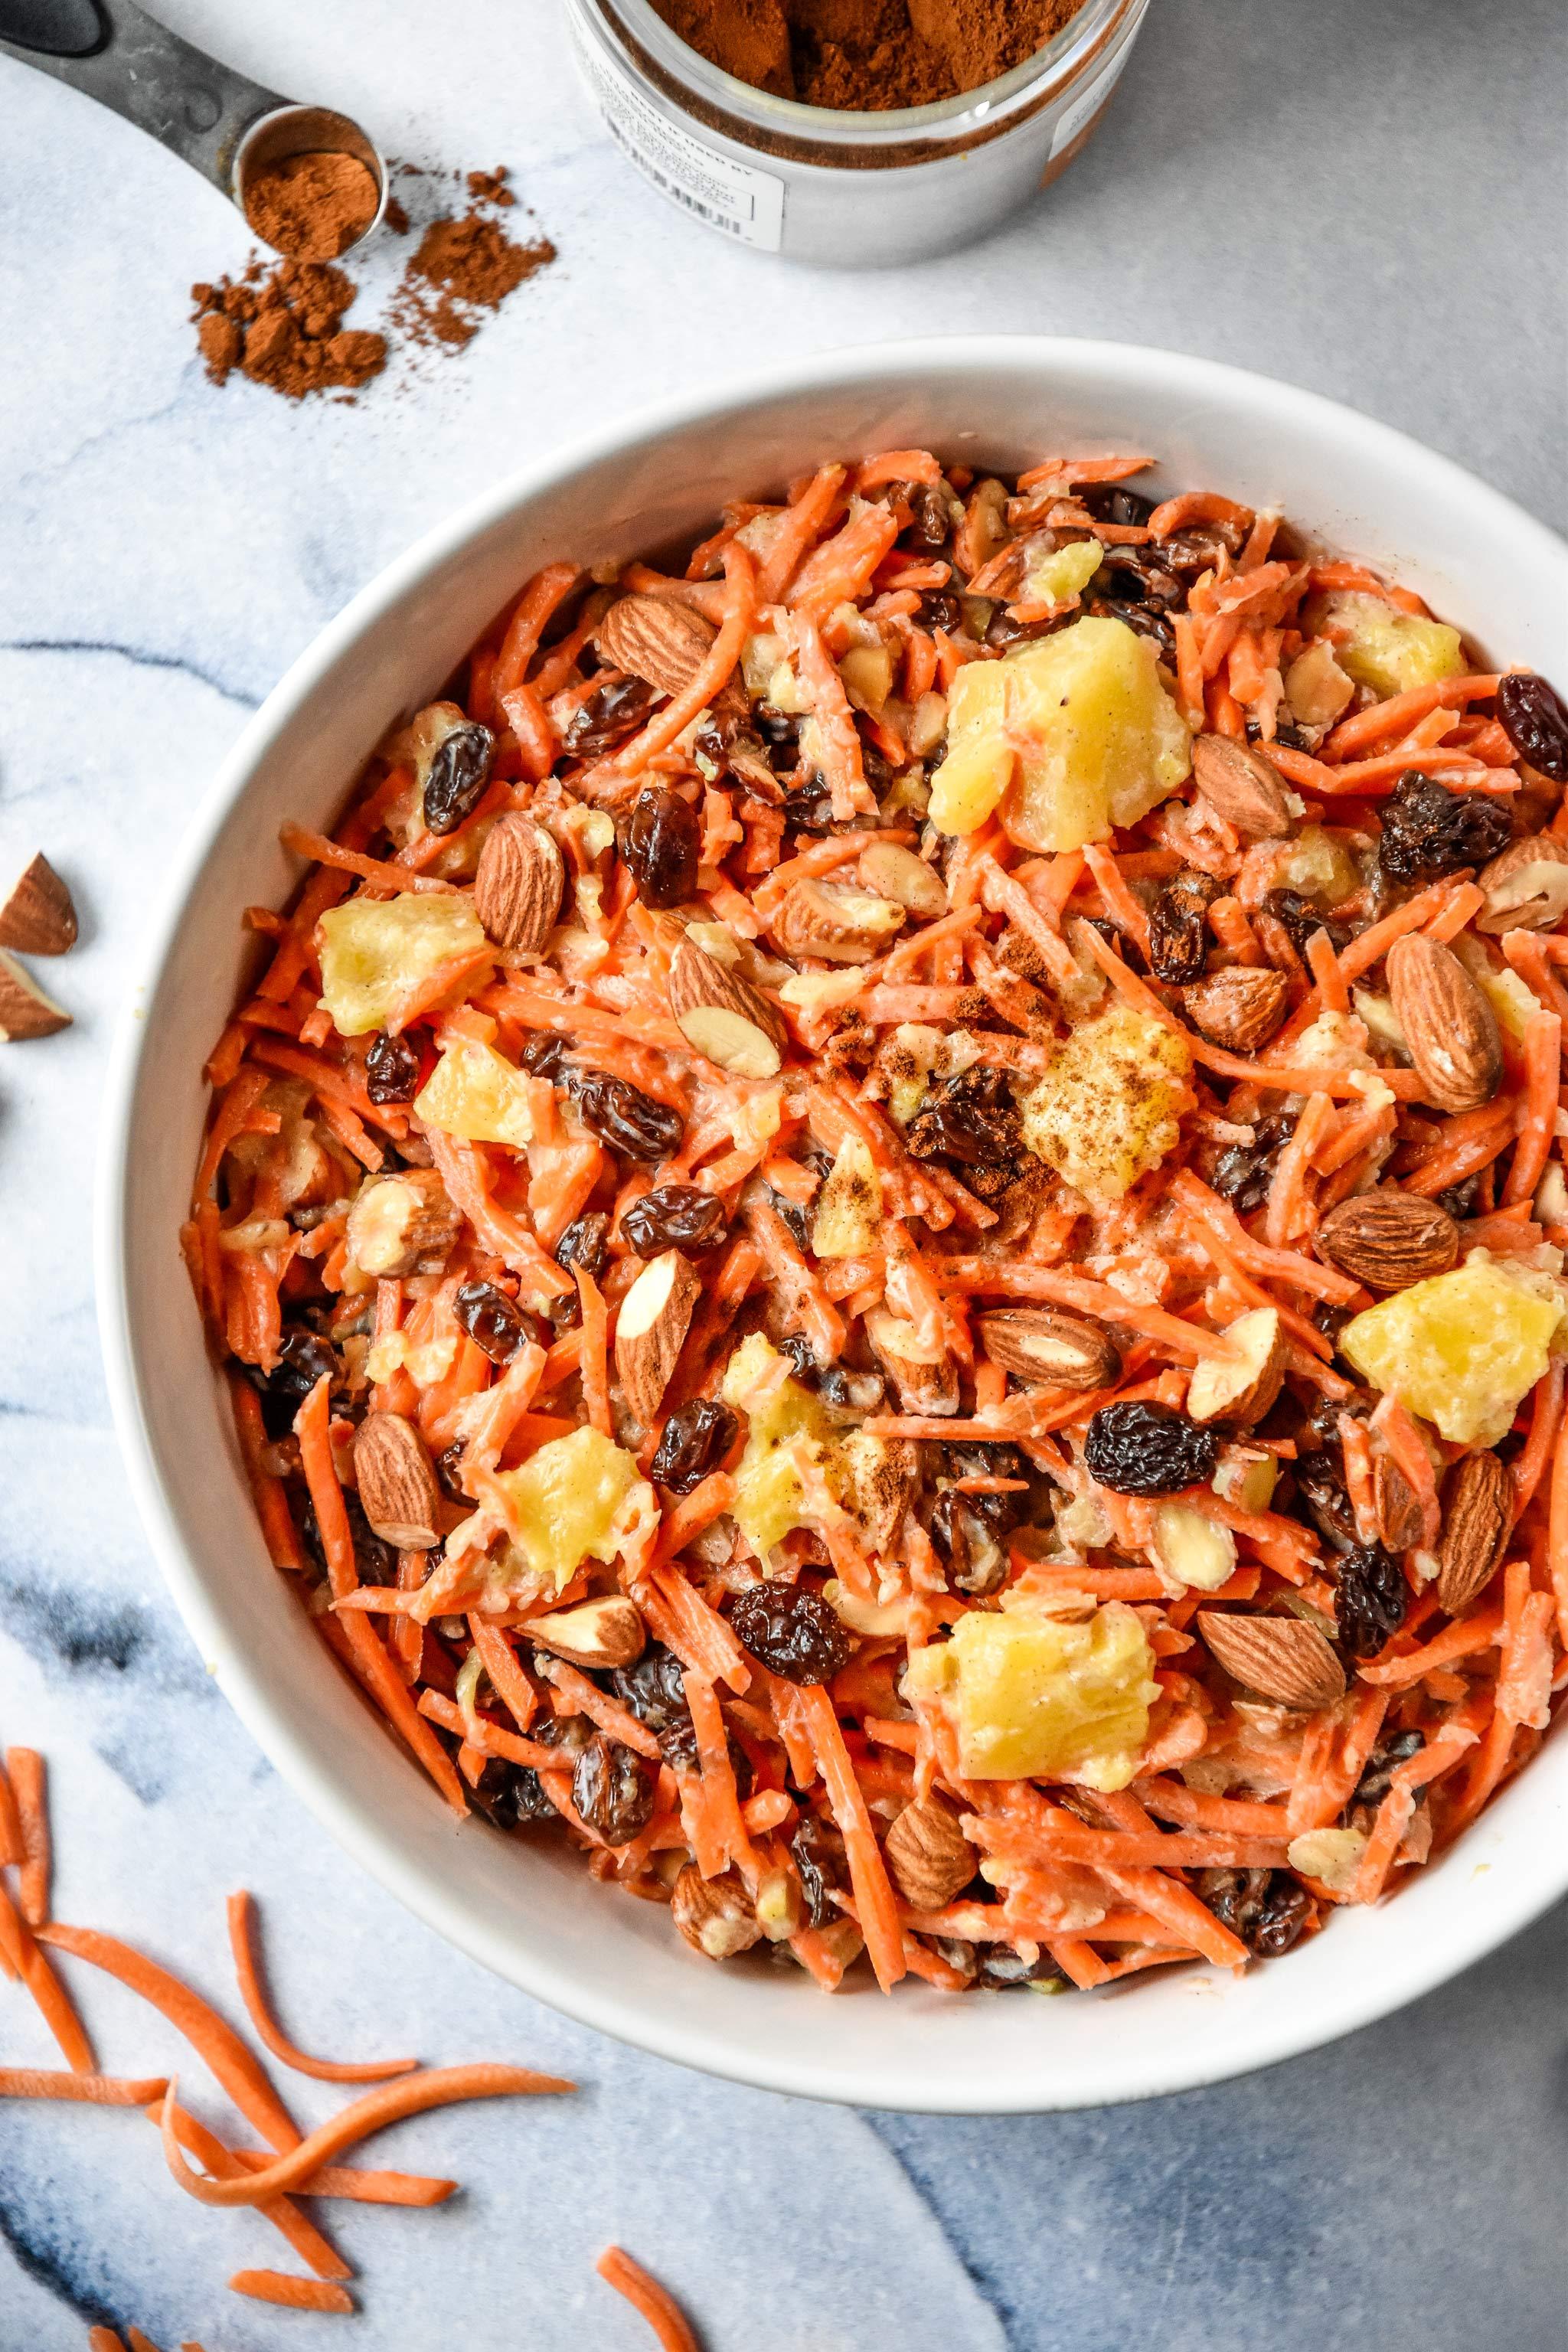 cinnamon raisin carrot salad in a white bowl